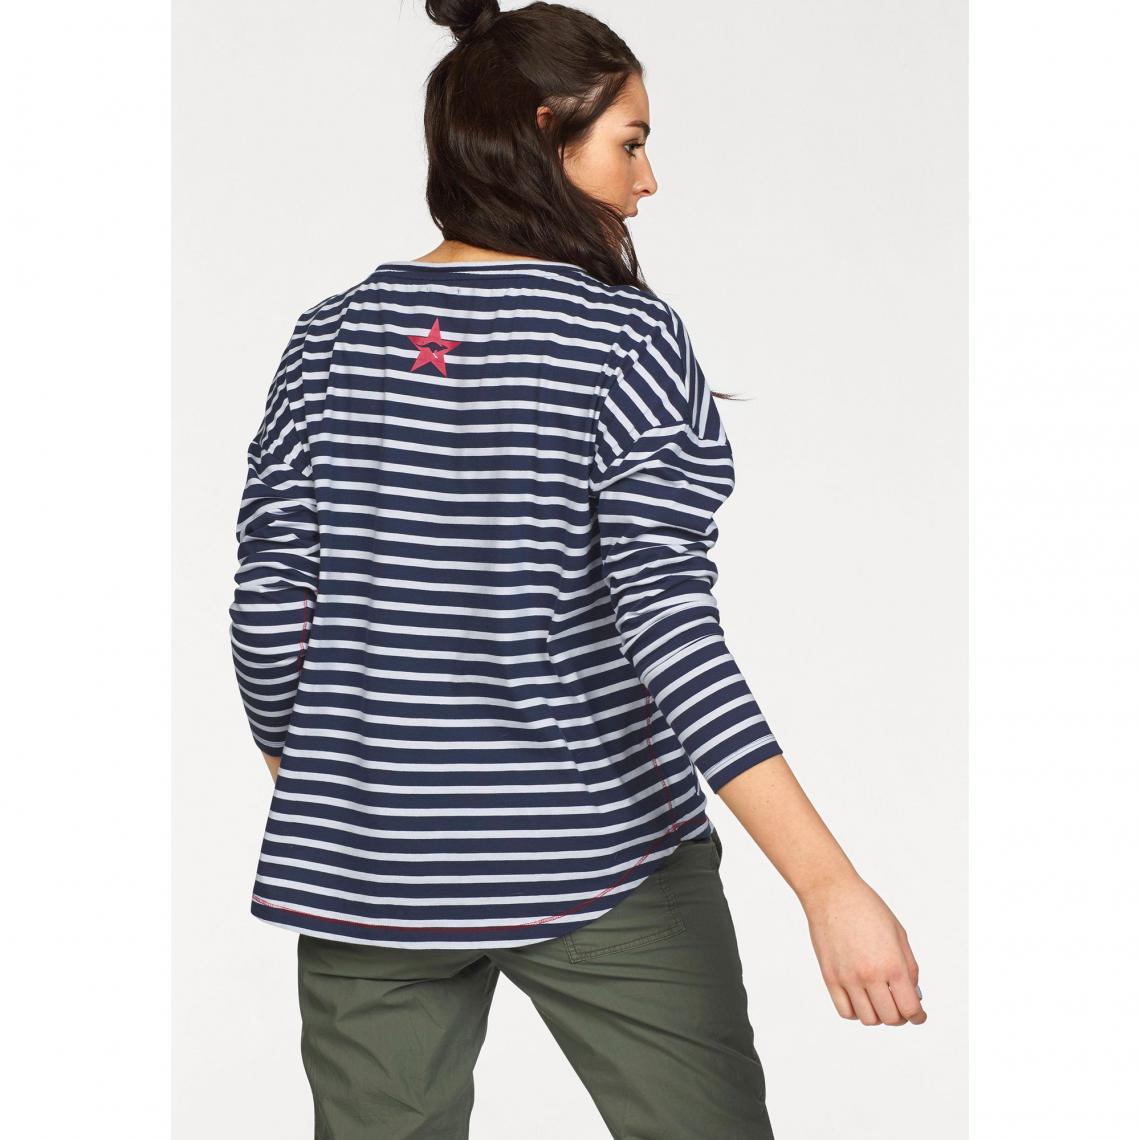 T-shirt marinière manches longues femme KangaROOS - Bleu  65972401020